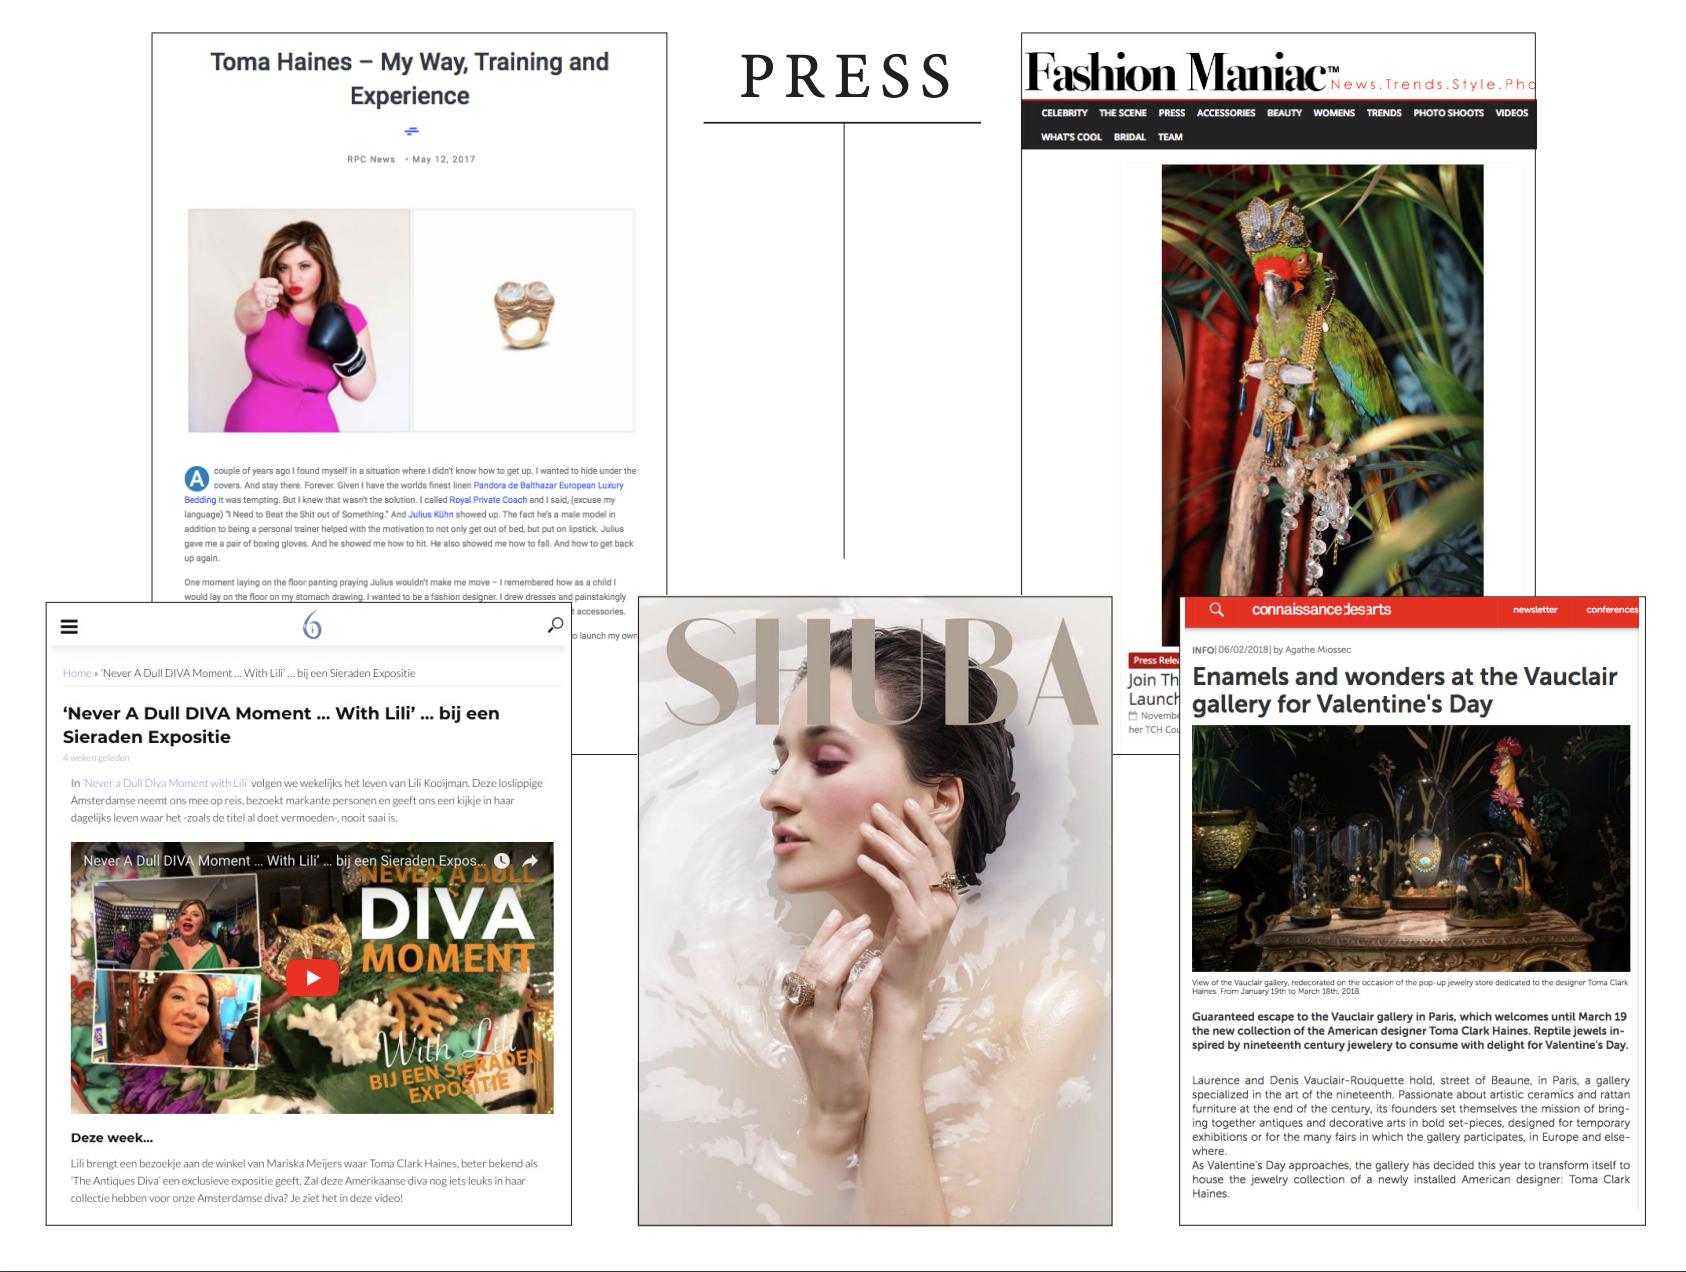 republic of toma jewelry - press kit design sarah pottharst 17.png